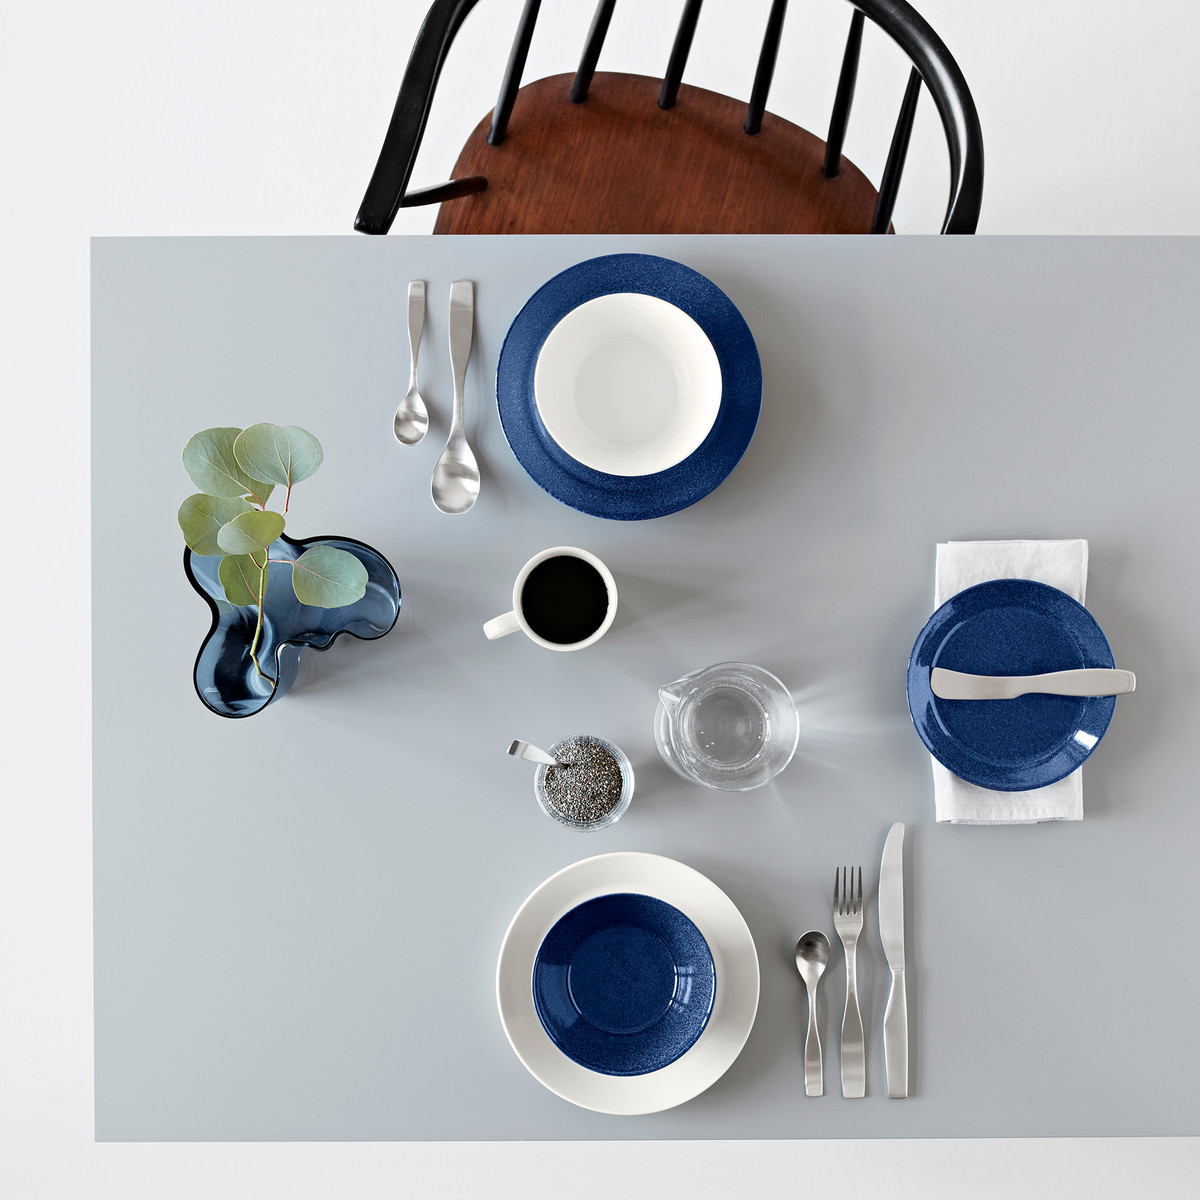 iittala teema collection for finland 100 designed by kaj franck uus tuus new kewl. Black Bedroom Furniture Sets. Home Design Ideas